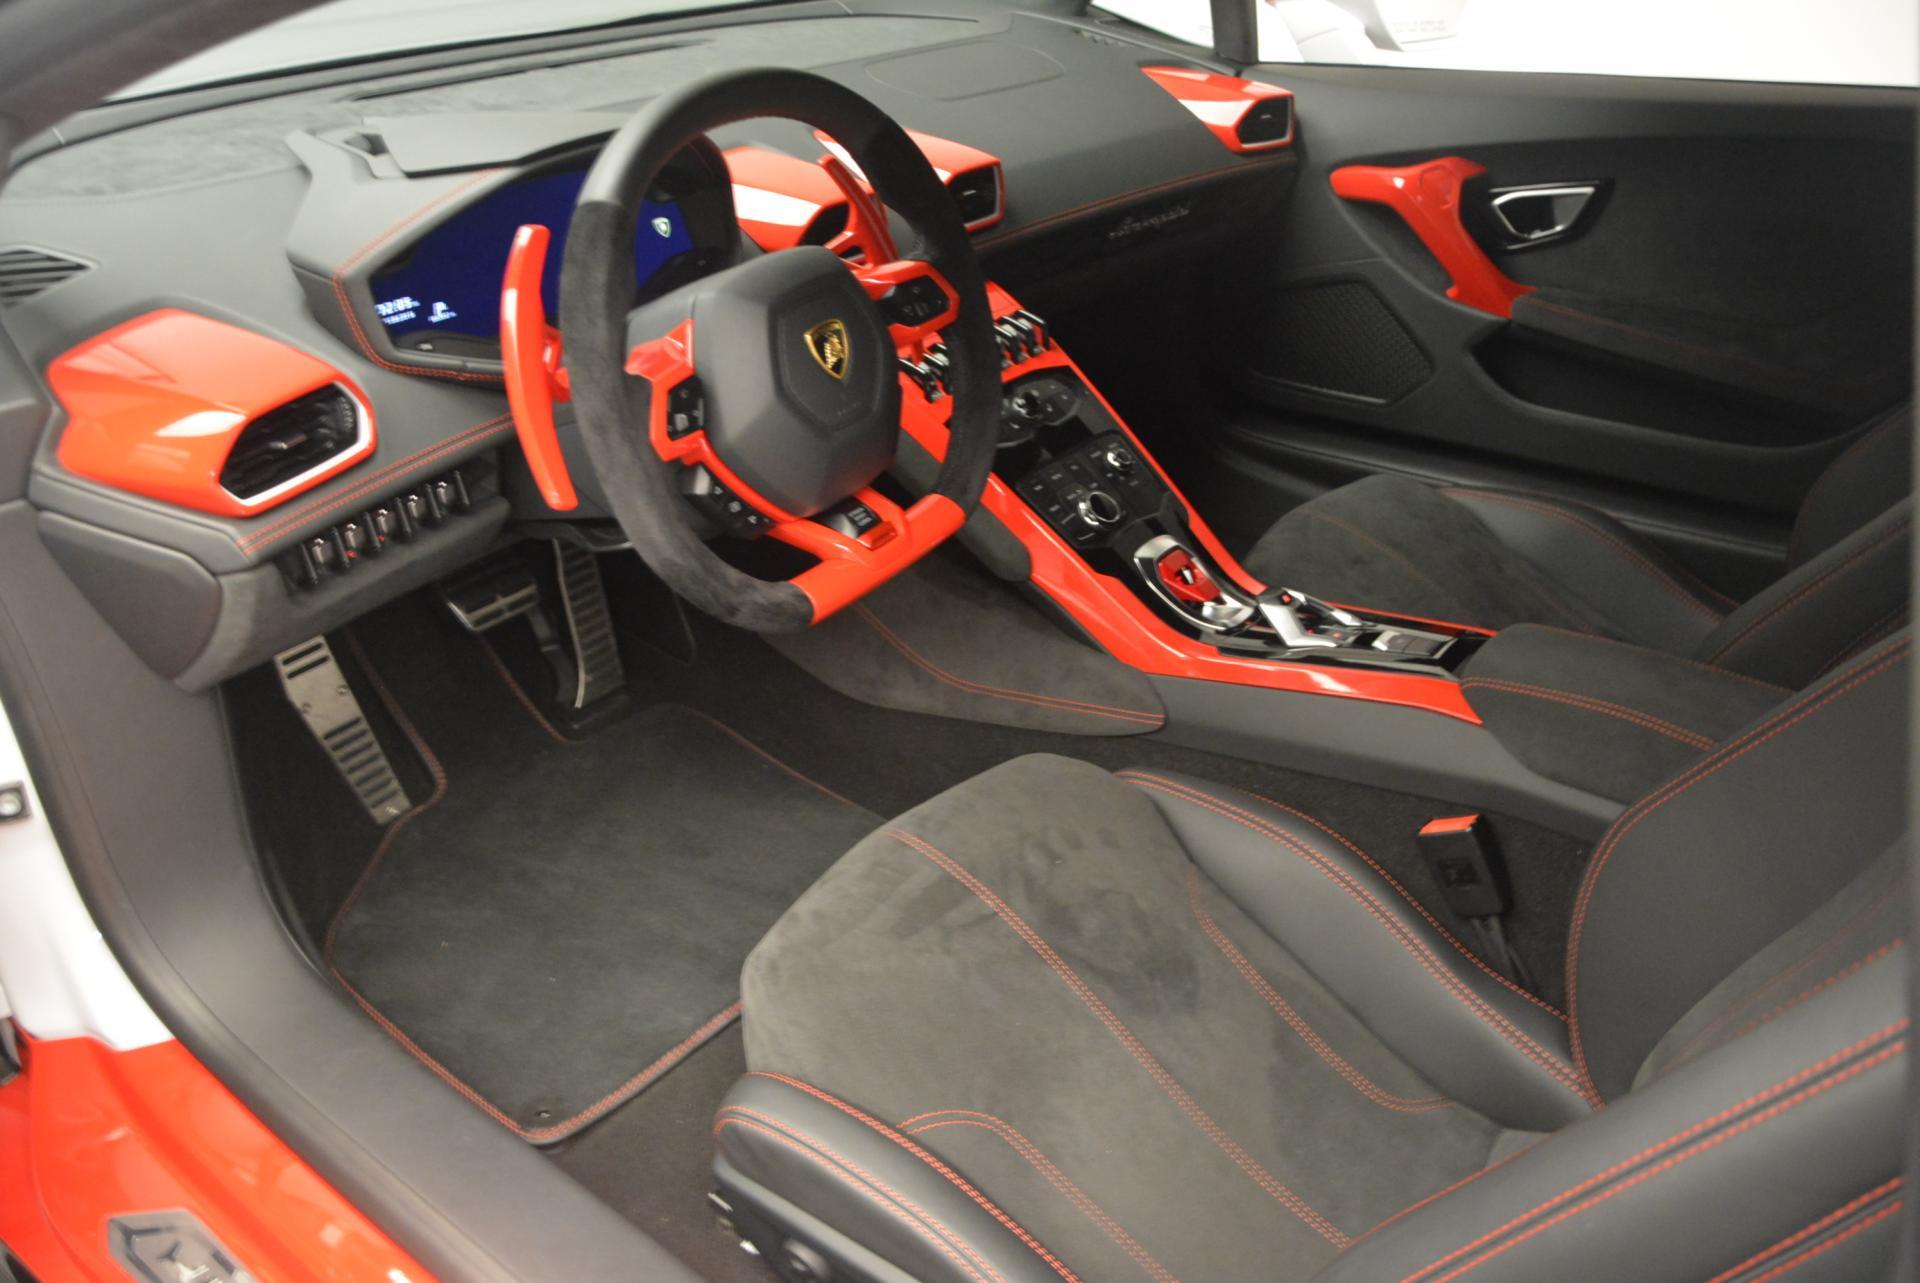 Used 2015 Lamborghini Huracan LP610-4 For Sale In Greenwich, CT. Alfa Romeo of Greenwich, F1707A 114_p16